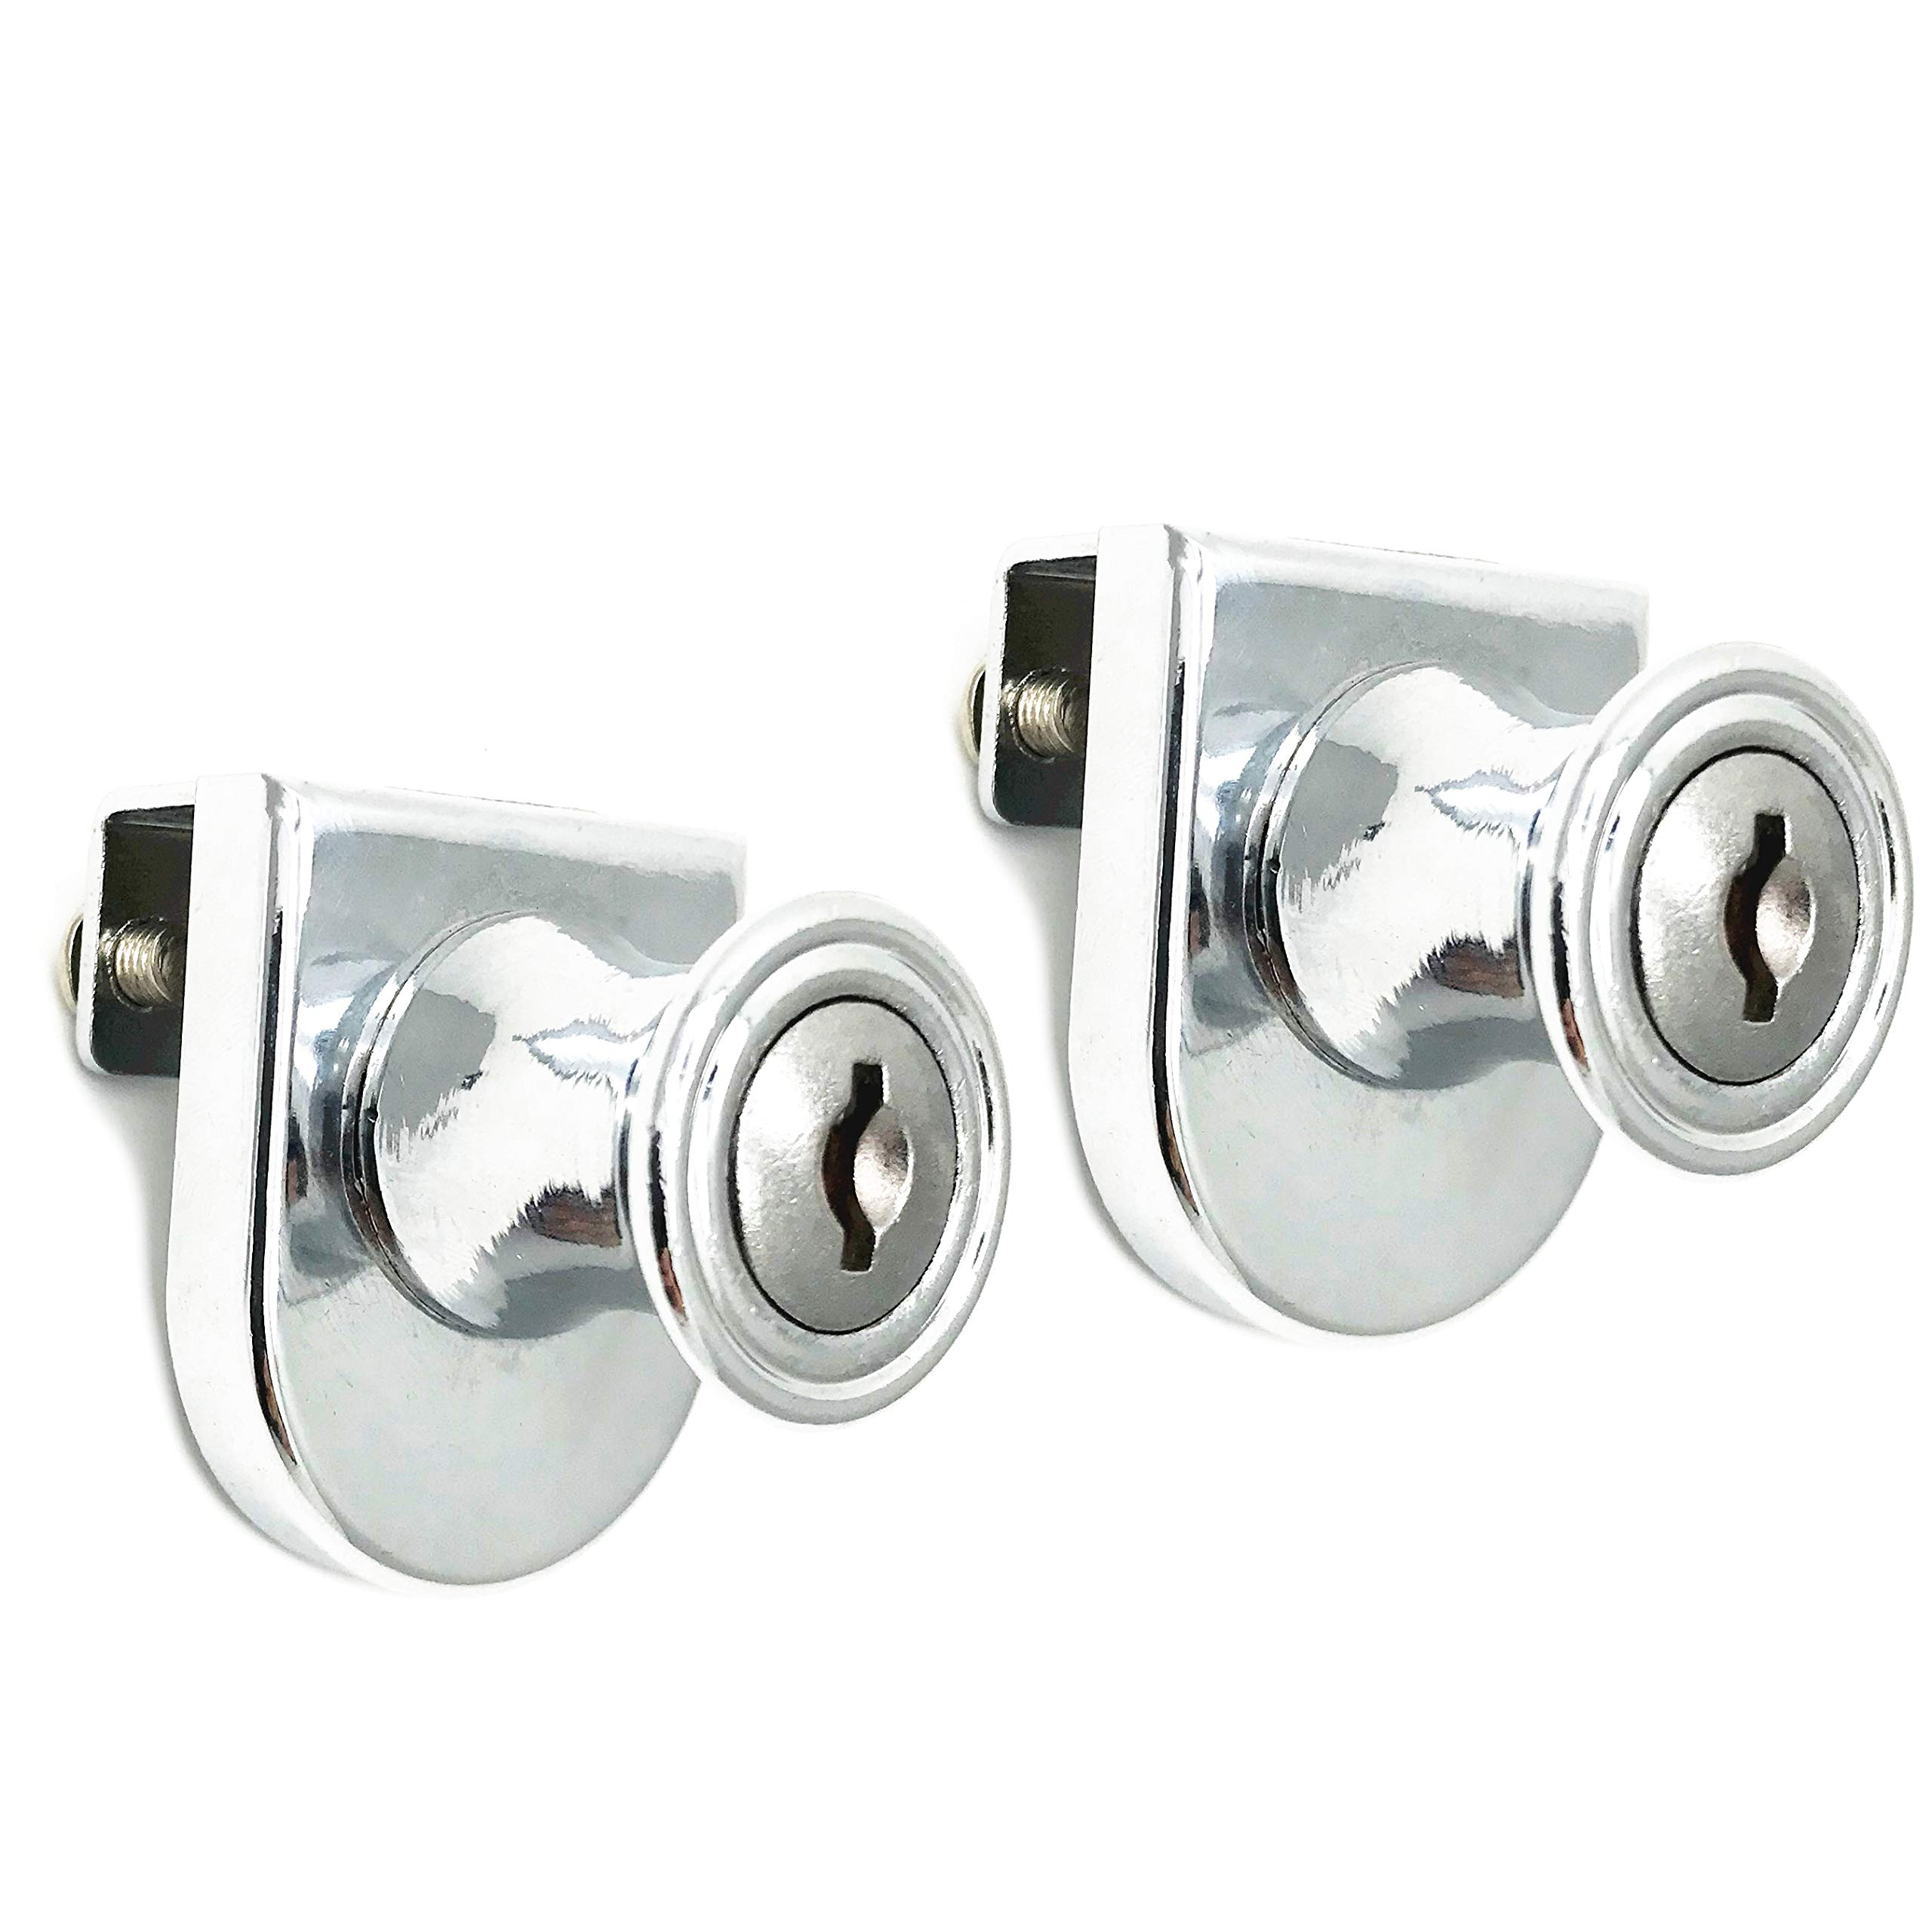 XMHF 2Pcs Glass Display Cabinet Showcase Lock Hinged Locker Zinc Alloy Chrome Finish, Key Different